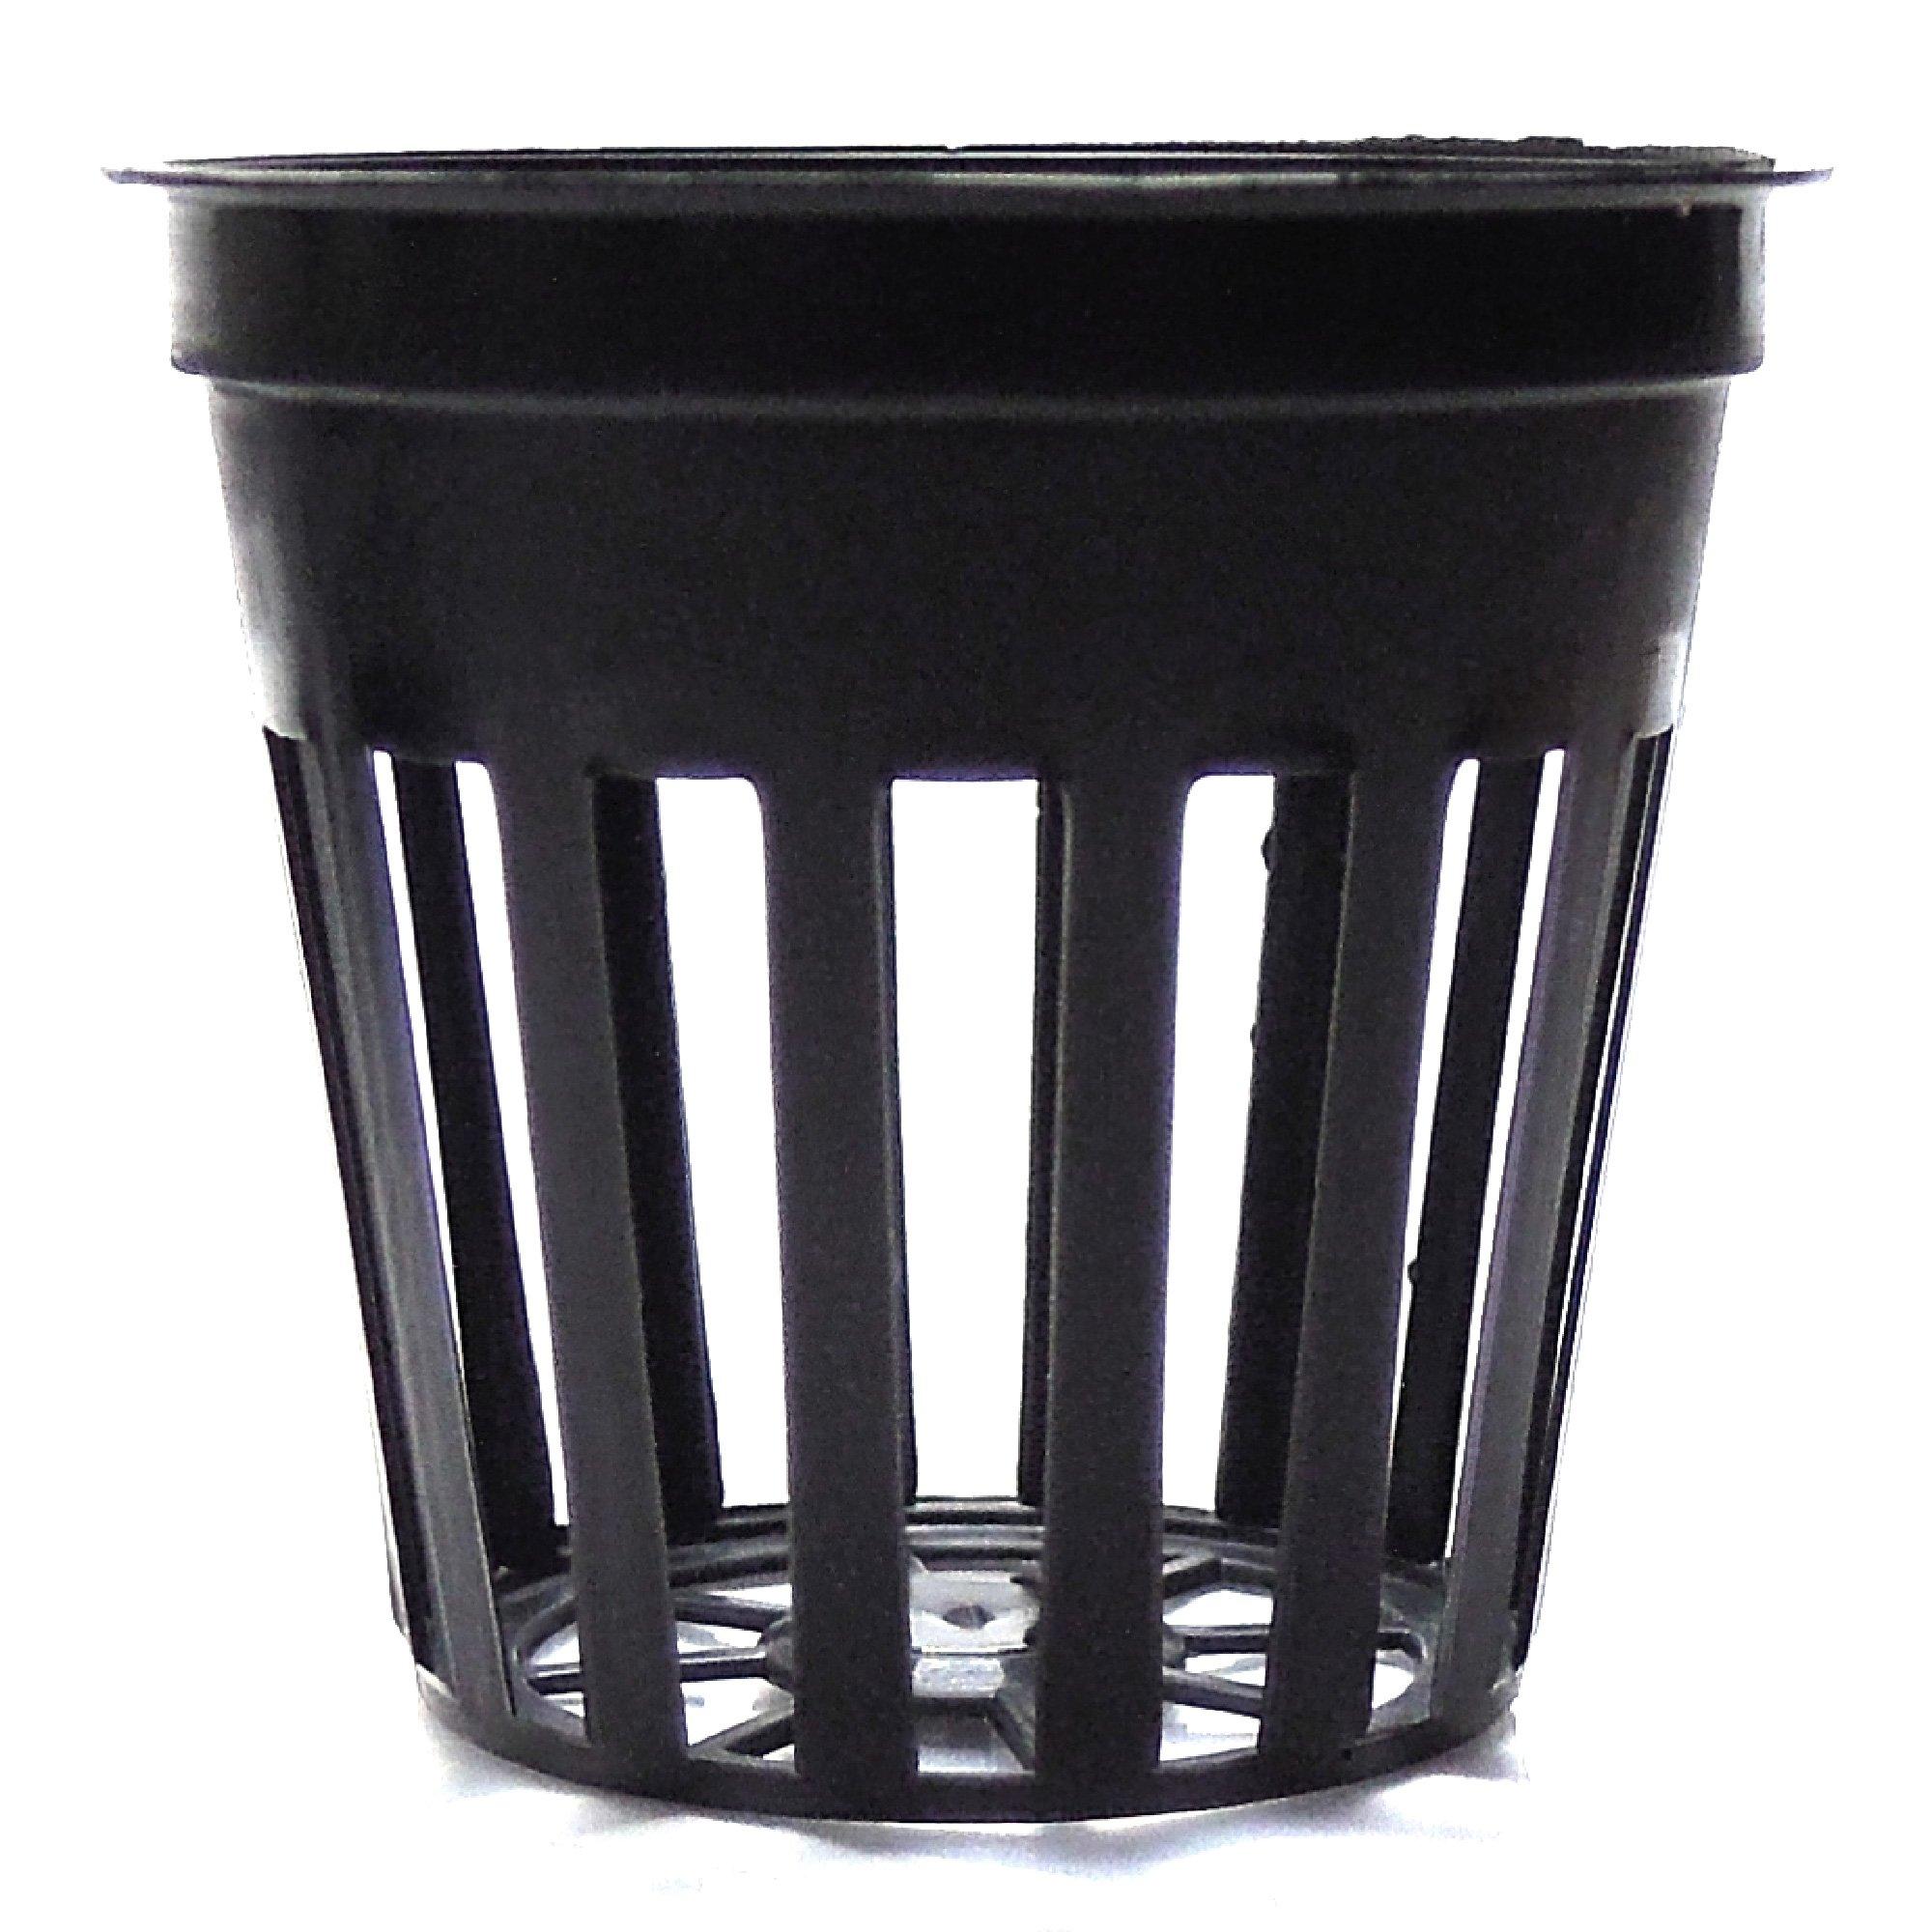 100 2 Inch Net Slit Pots for Hydroponic Aeroponic Use